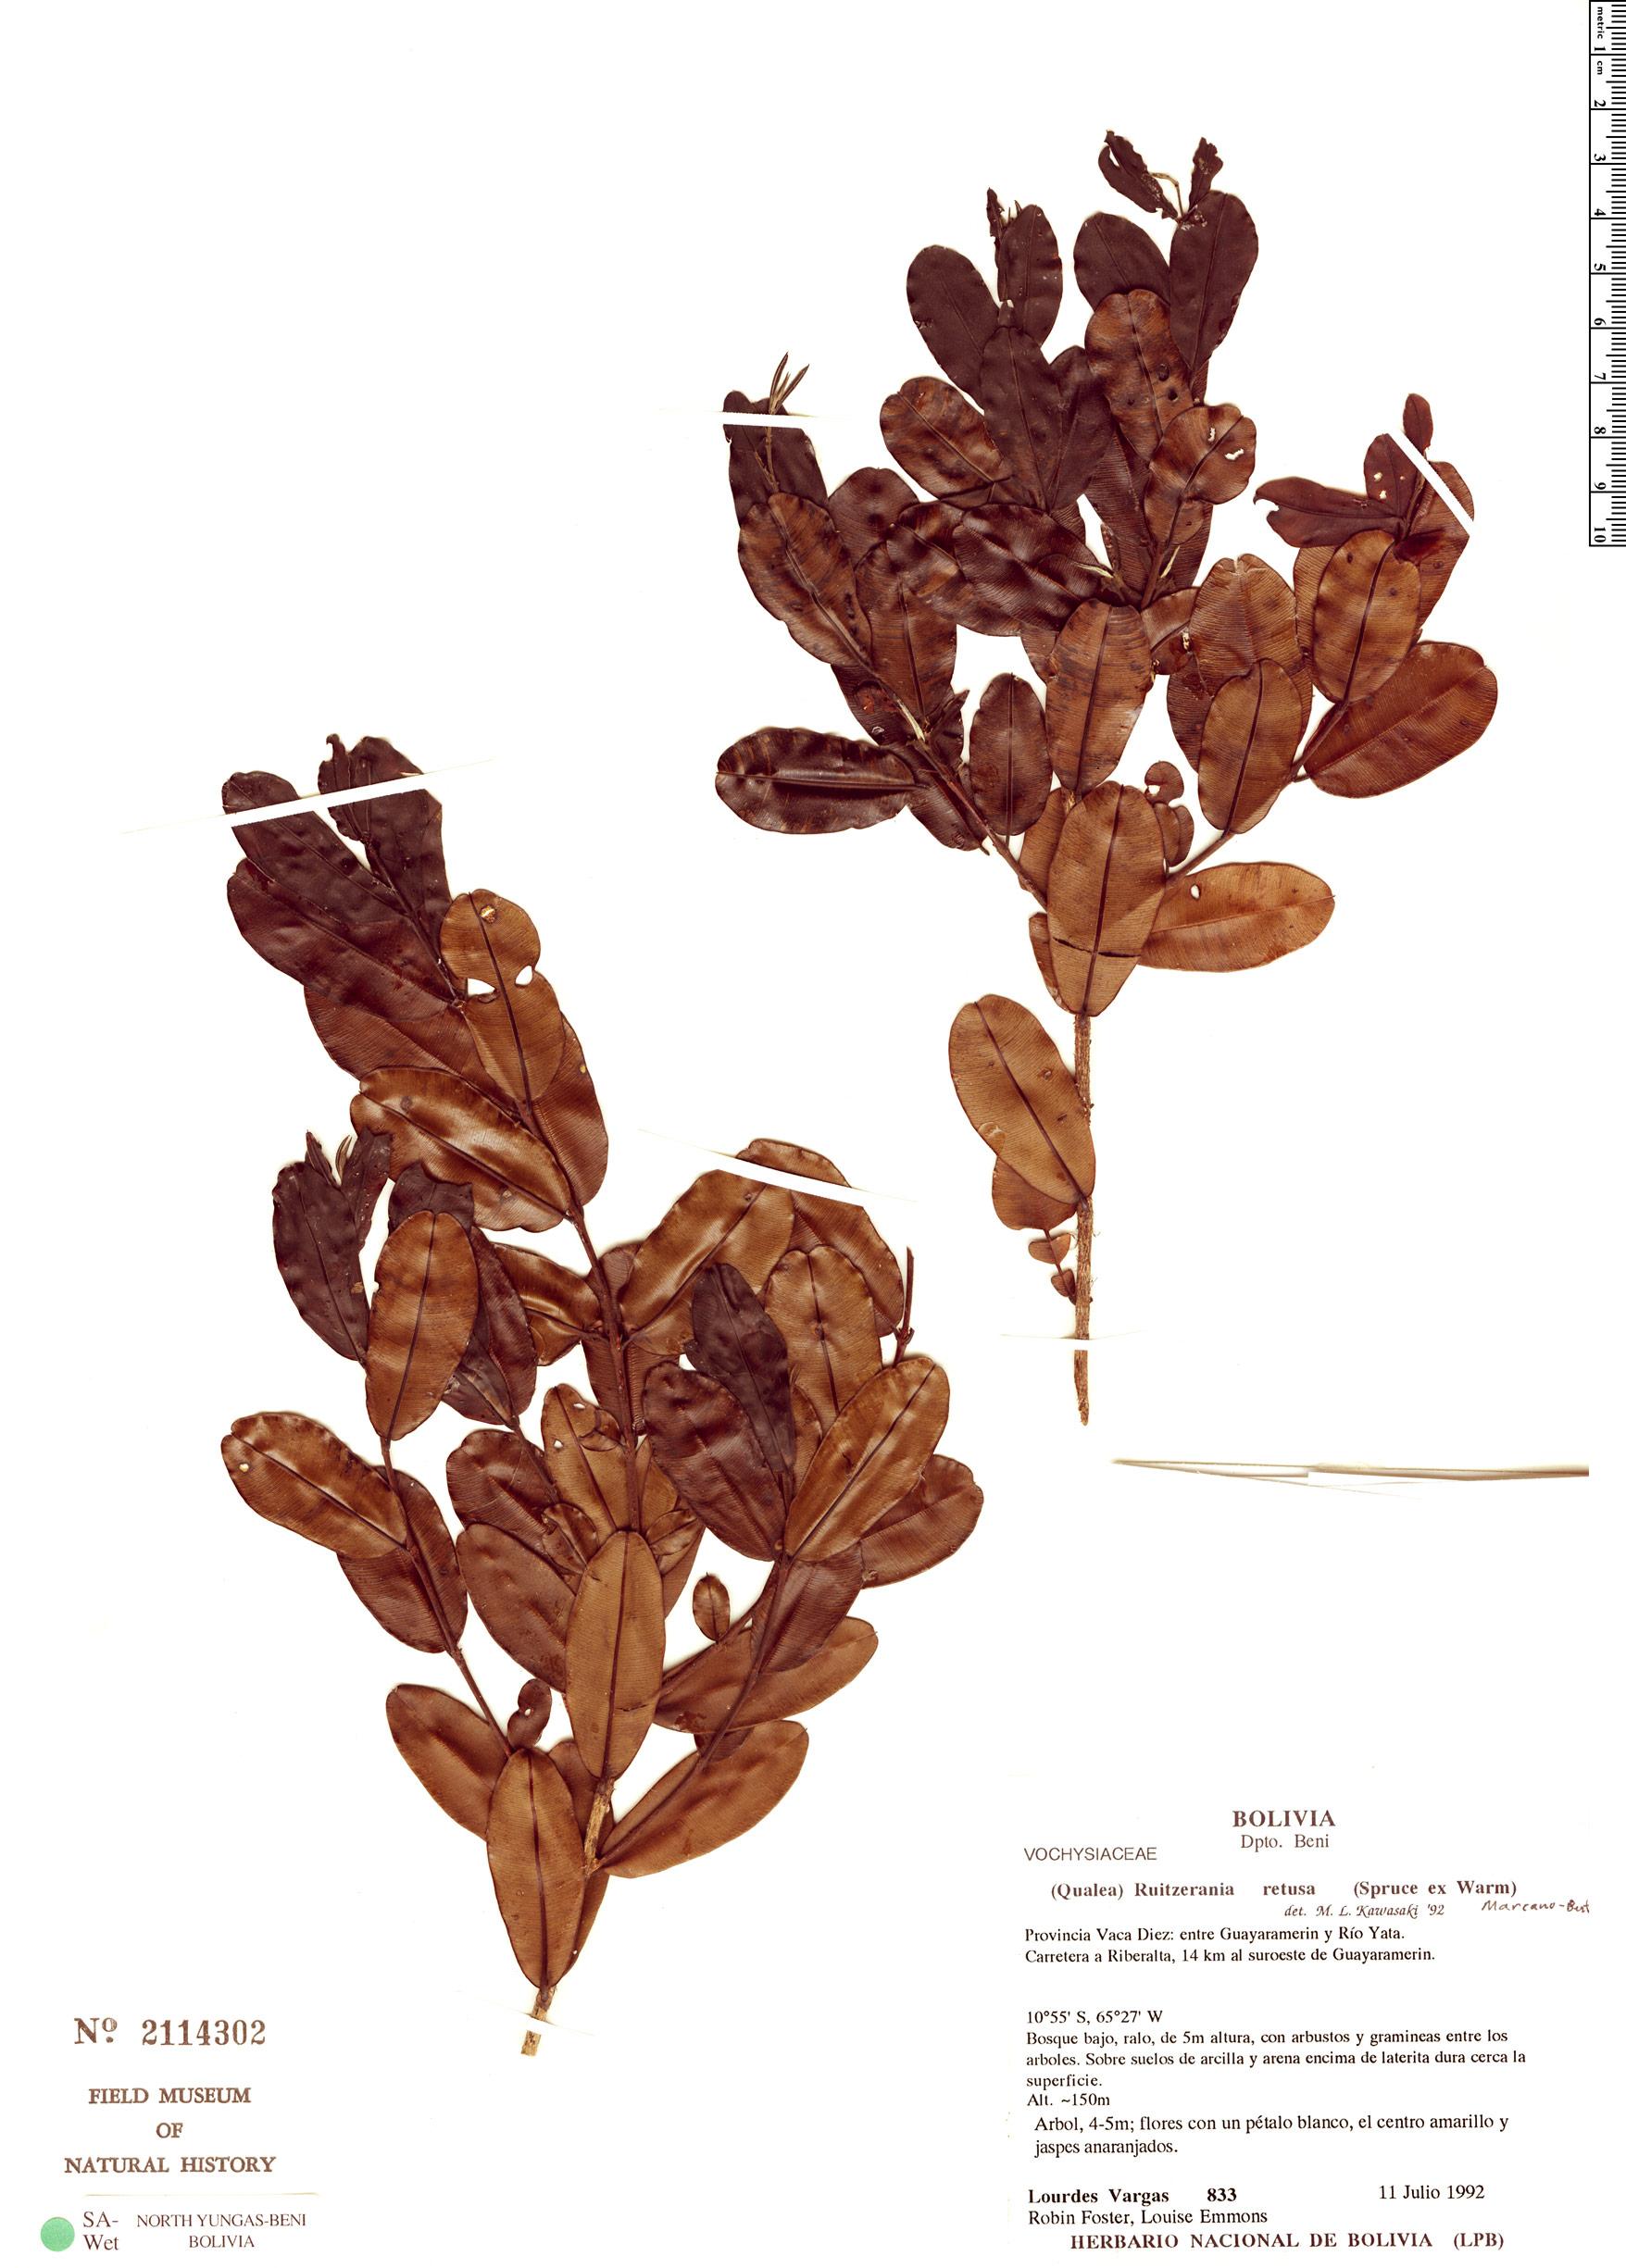 Specimen: Ruizterania retusa